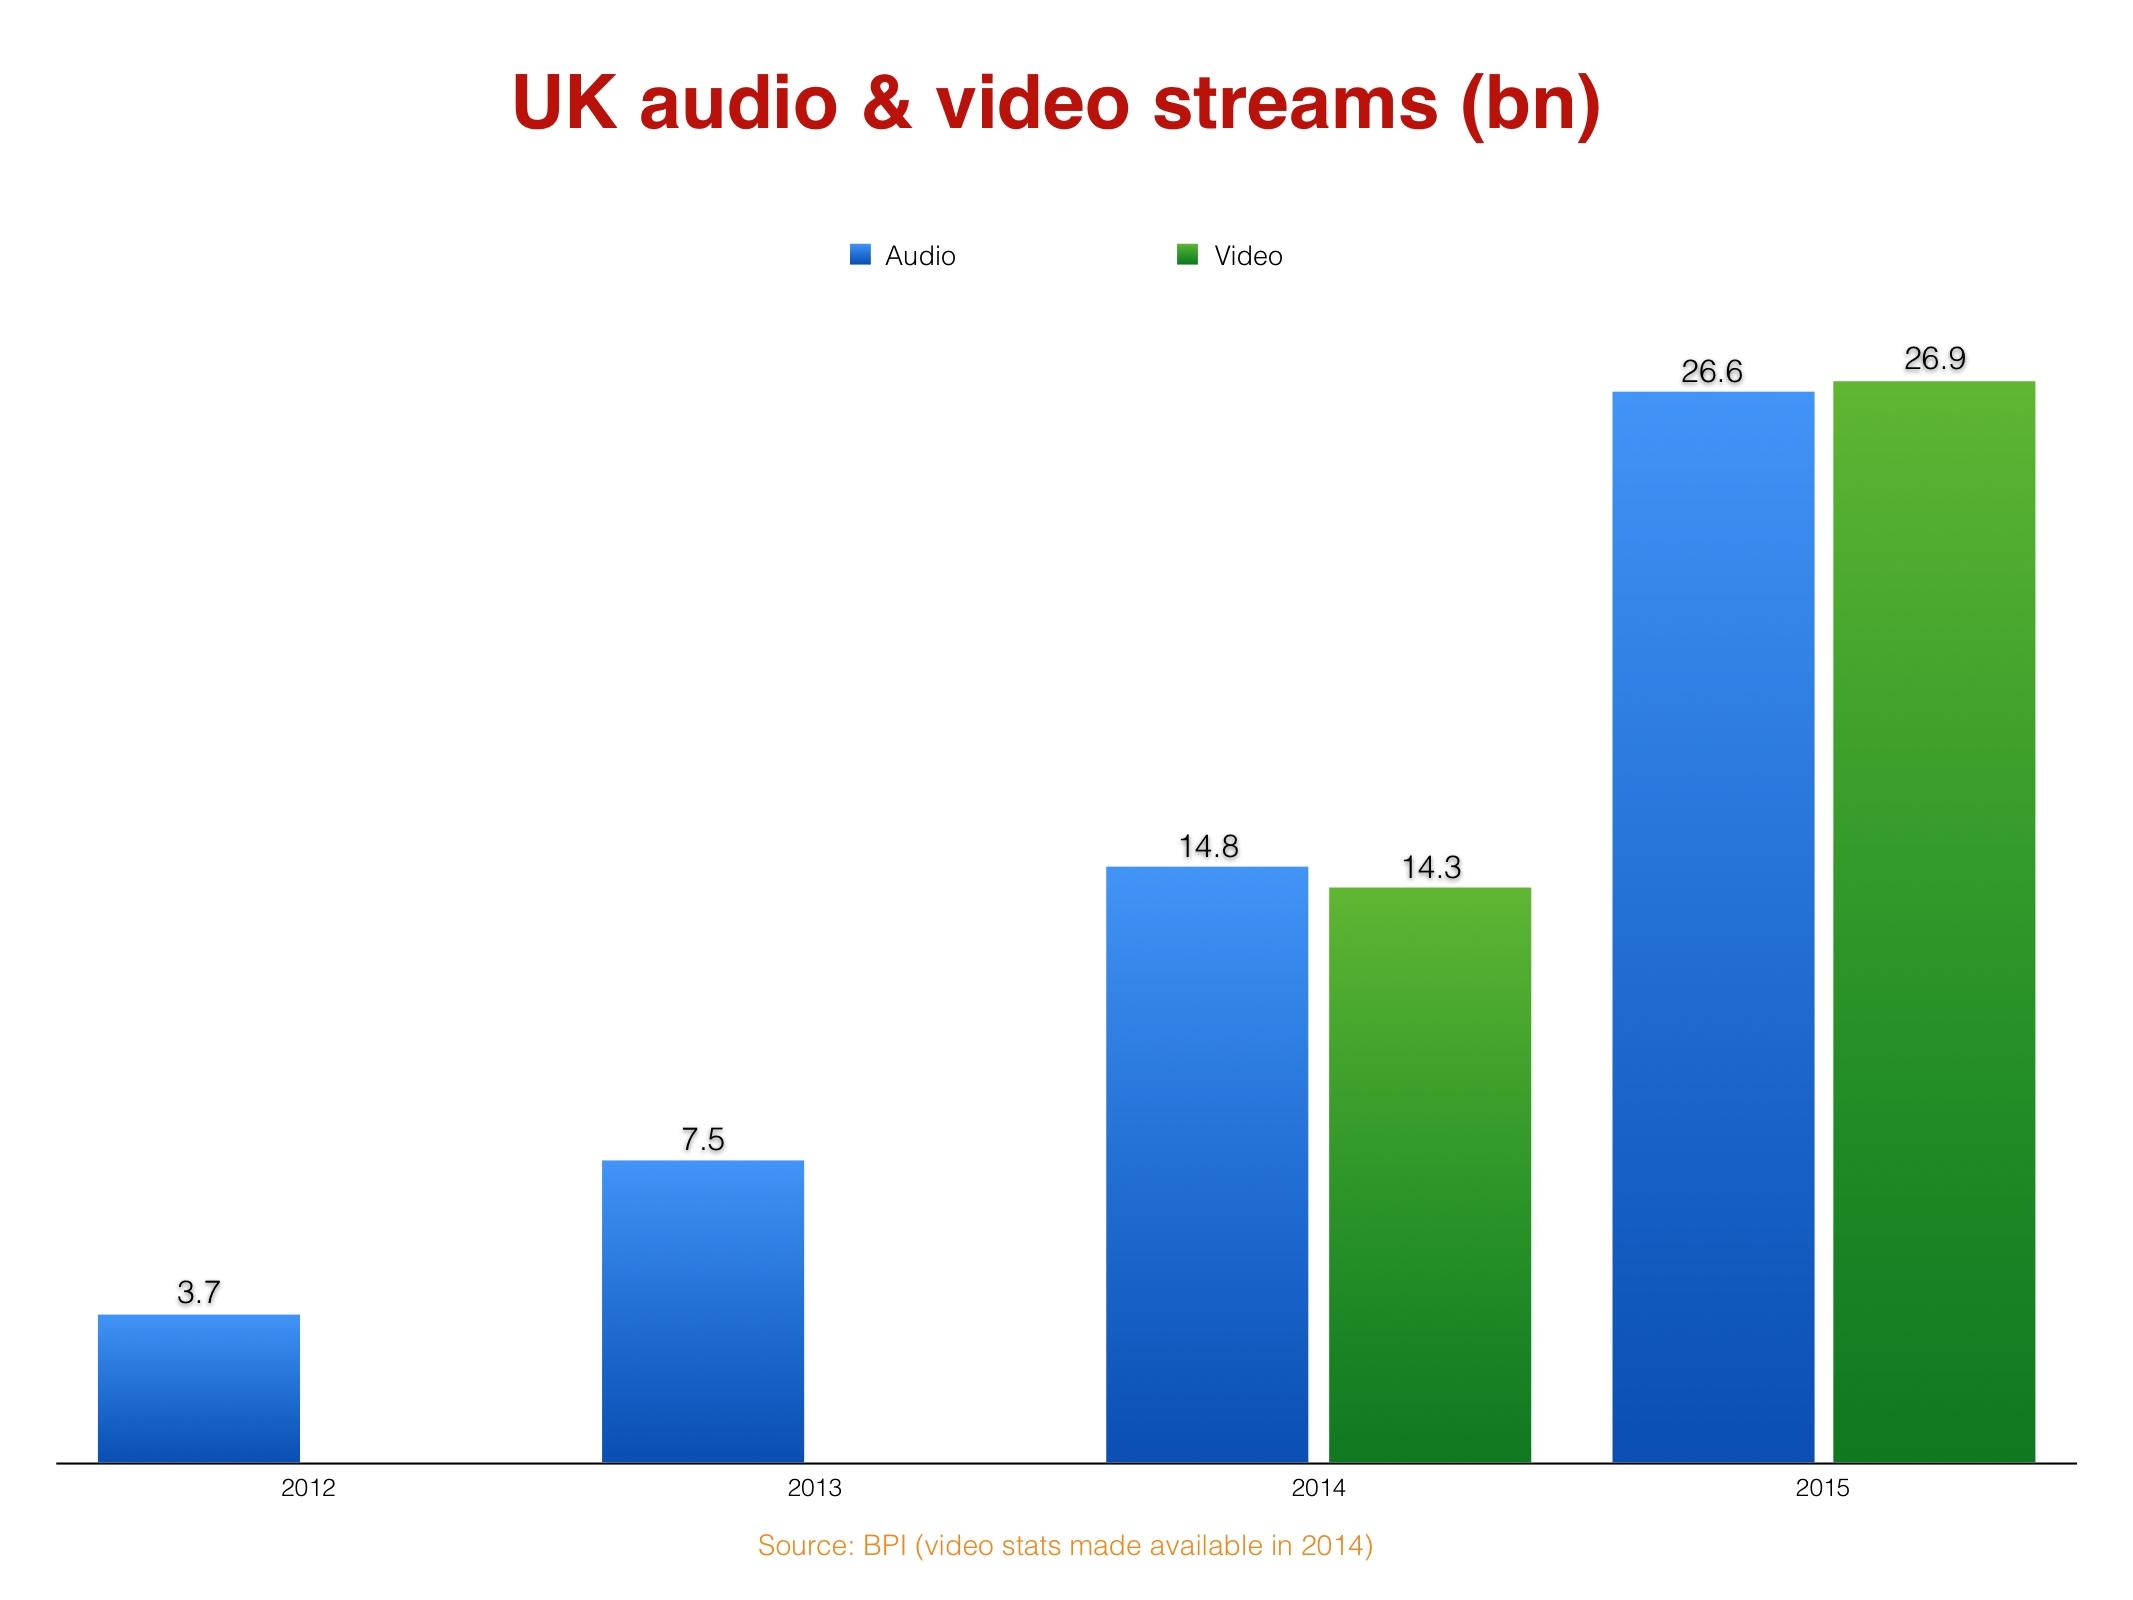 UKvideoandaudio